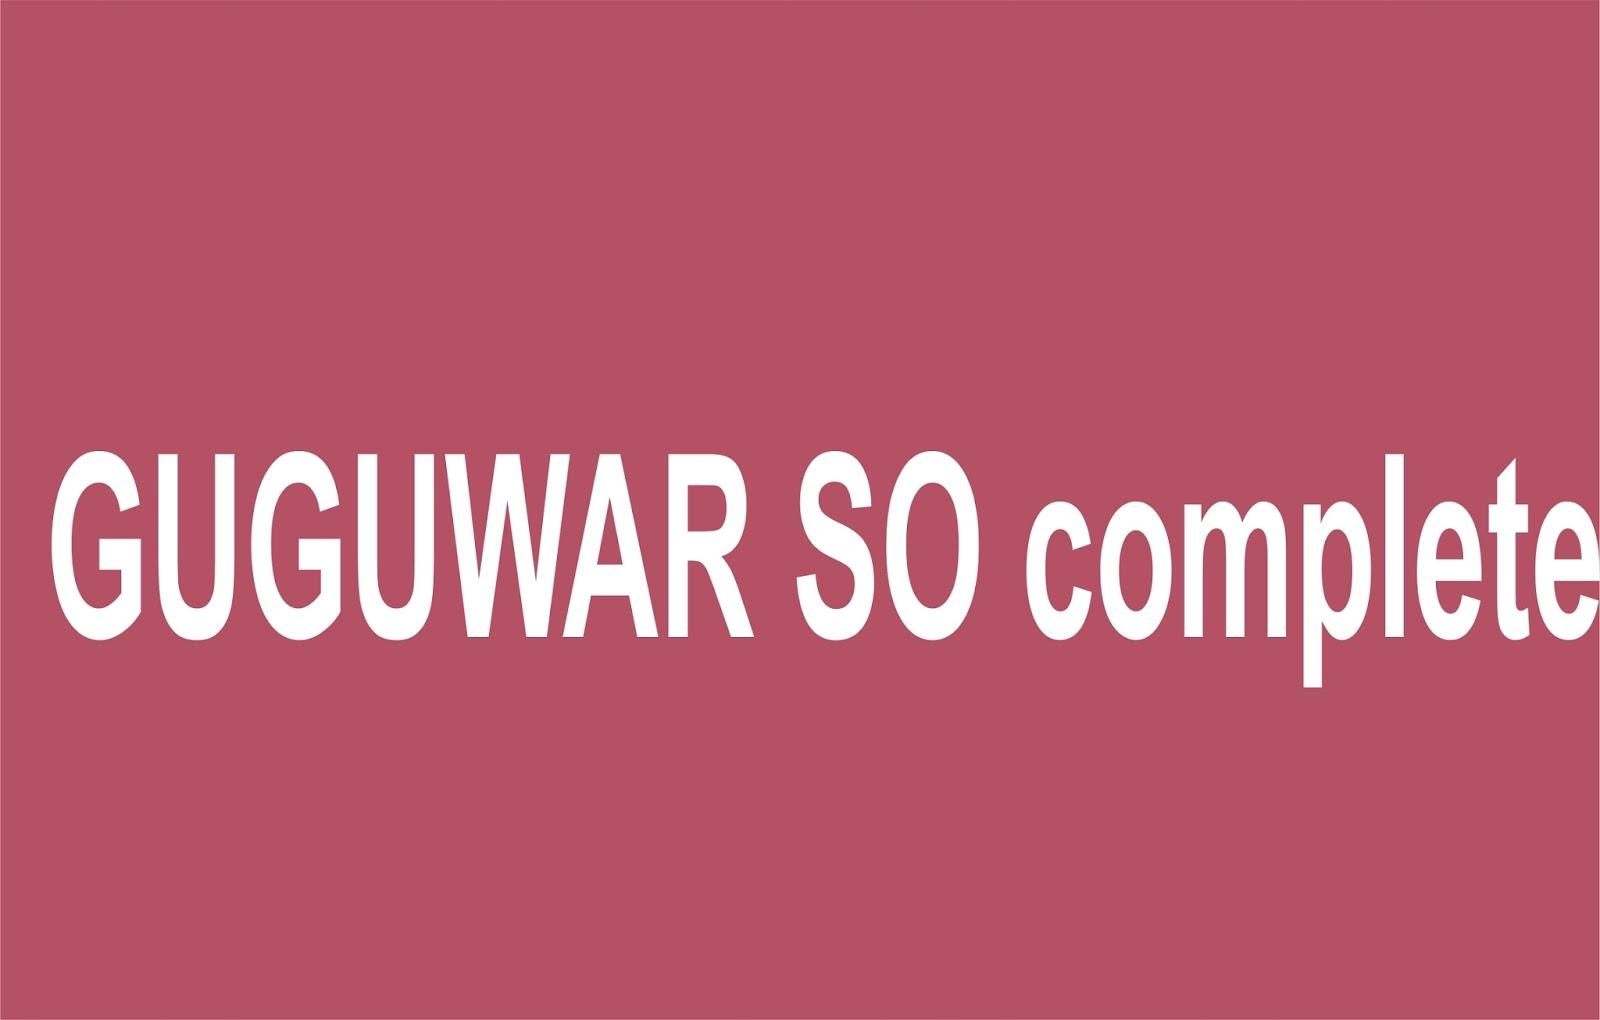 GUGUWAR SO complete - Gidan Novels | Hausa Novels